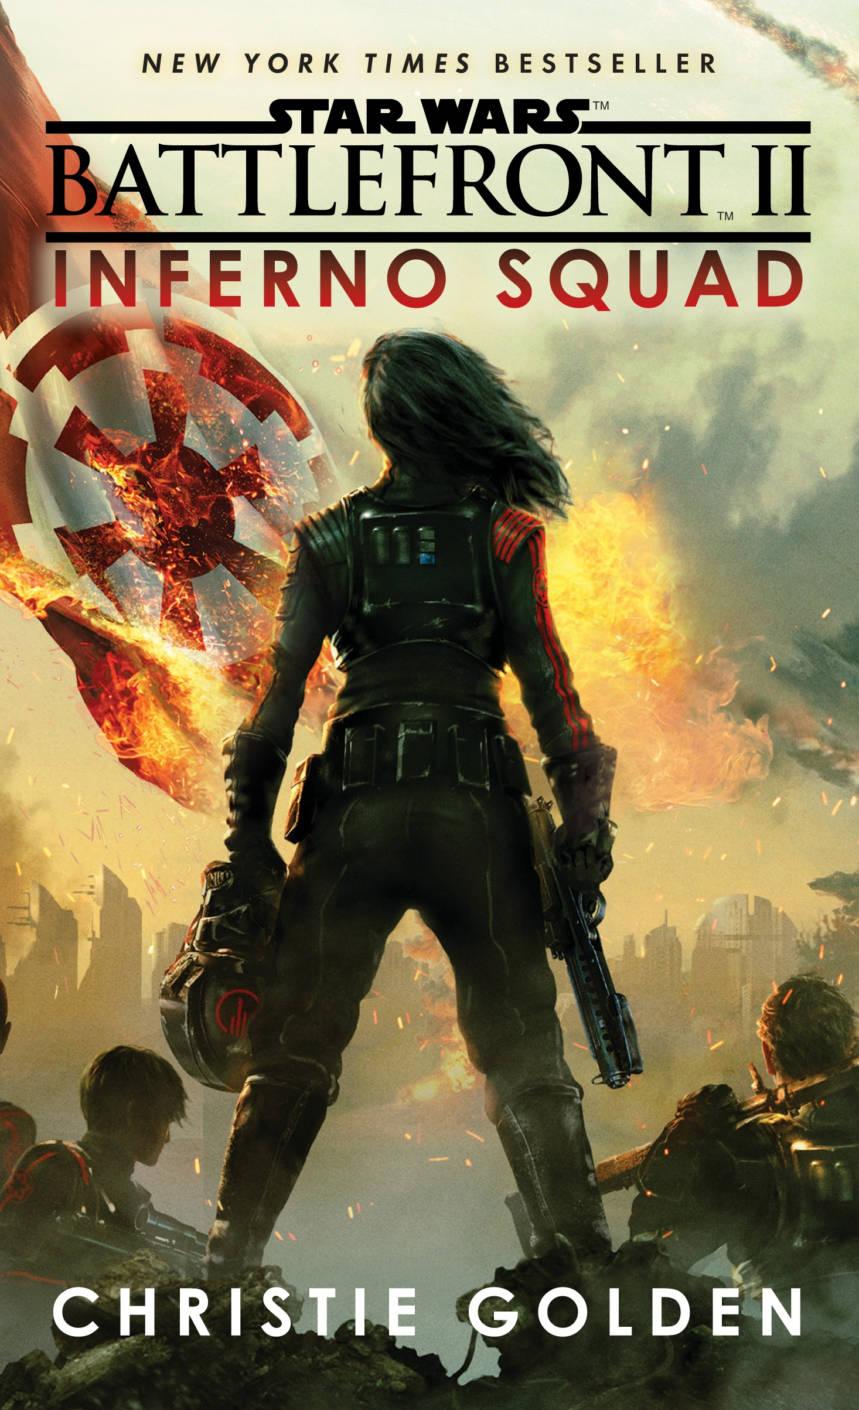 Star Wars: Battlefront II Inferno Squad